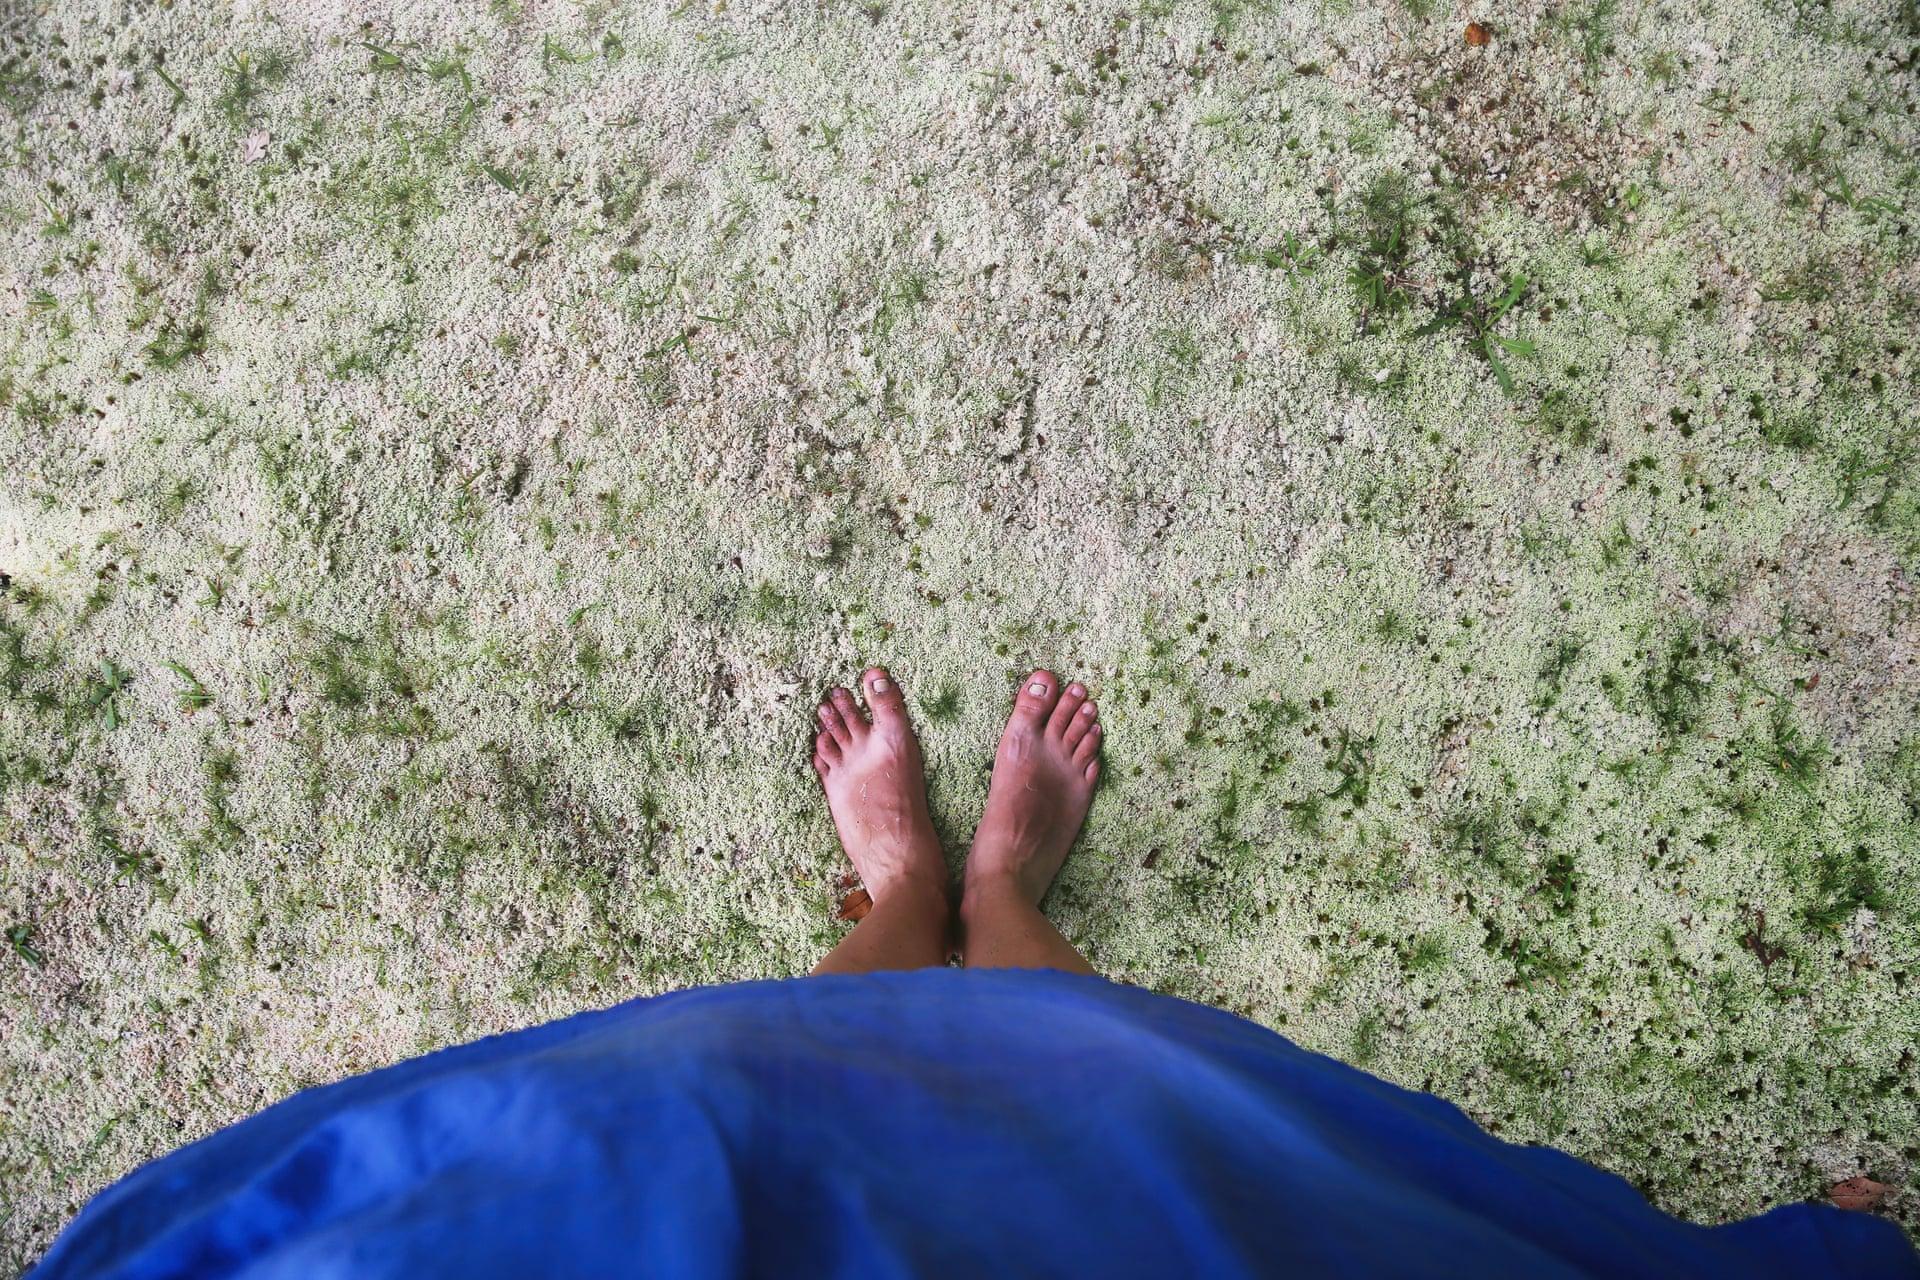 H Αντελα Νιστόρα διηγείται την ιστορία πίσω από την παραπάνω εικόνα. «Εκείνη την ημέρα στο νησί Σάο Μιγκέλ (Αζόρες, Πορτογαλία) πάτησα πάνω στο πιο απίστευτα μαλακό στρώμα από βρύα που είχα αισθανθεί ποτέ κάτω από τα πόδια μου. Μέχρι το 2016, που τραβήχτηκε η φωτογραφία, ήμουν 31 ετών και είχα μετακομίσει περισσότερες από 30 φορές σε πέντε διαφορετικές χώρες. Λένε ότι το σπίτι είναι όπου βρίσκεται η καρδιά σου. Η καρδιά μου χωρίζεται σε κομμάτια σε όλο τον κόσμο, αλλά ένα μεγάλο μέρος της θα είναι πάντοτε στα σύνορα των Αζορών»